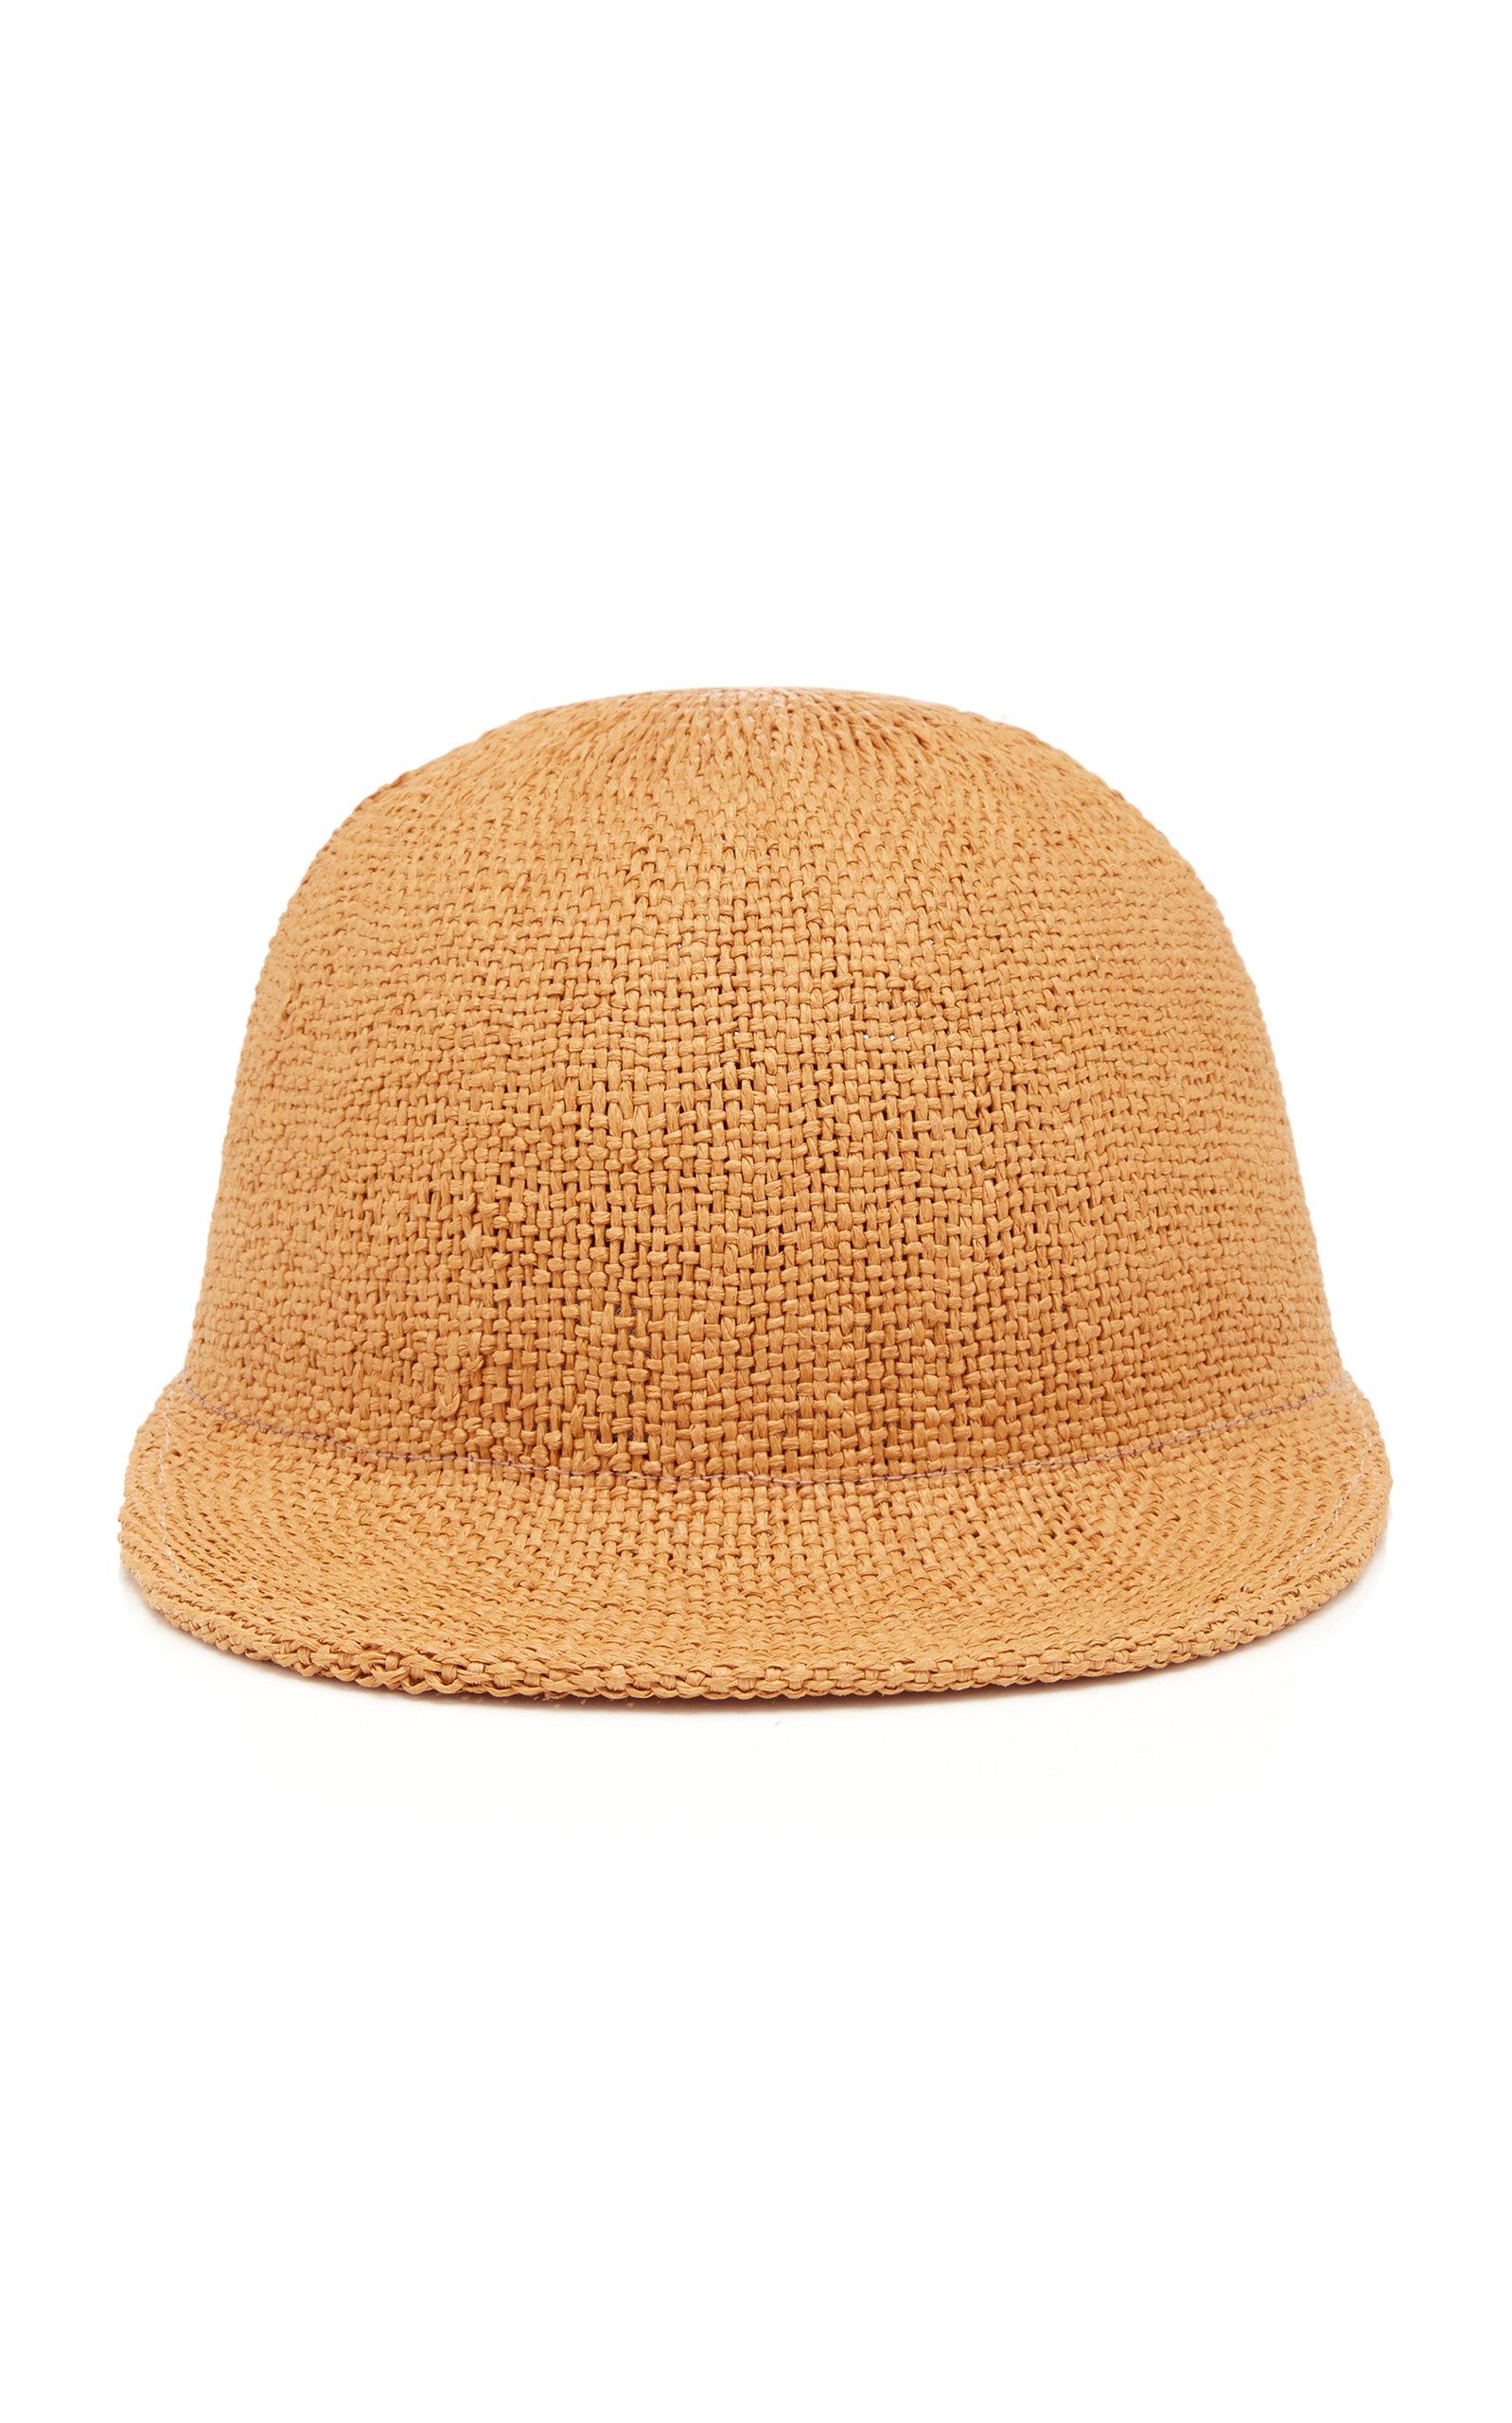 JANESSA LEONE DAMIEN STRAW CAP